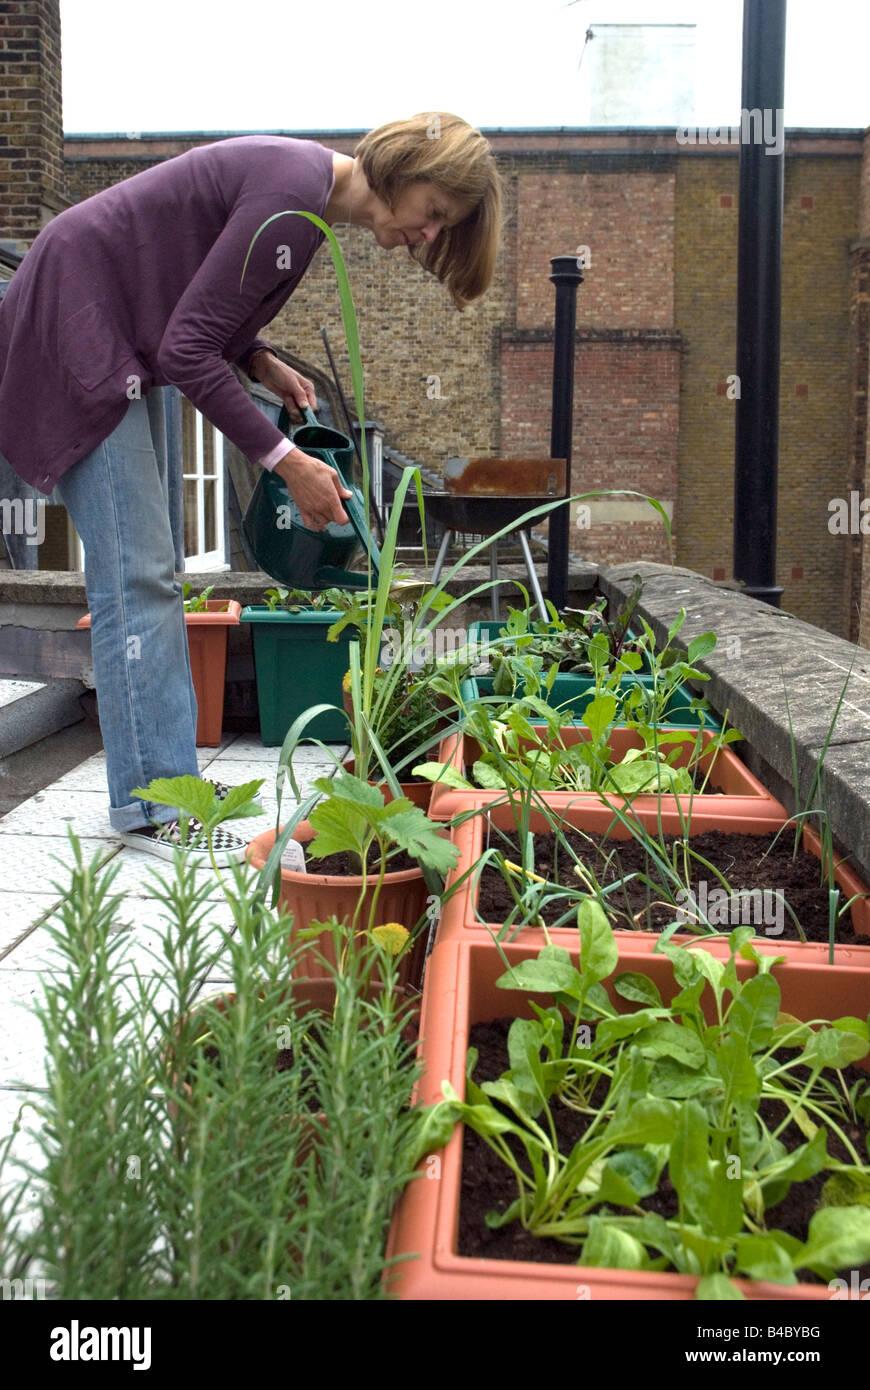 Woman Watering Vegetables Salads Urban Rooftop Vegetable Garden